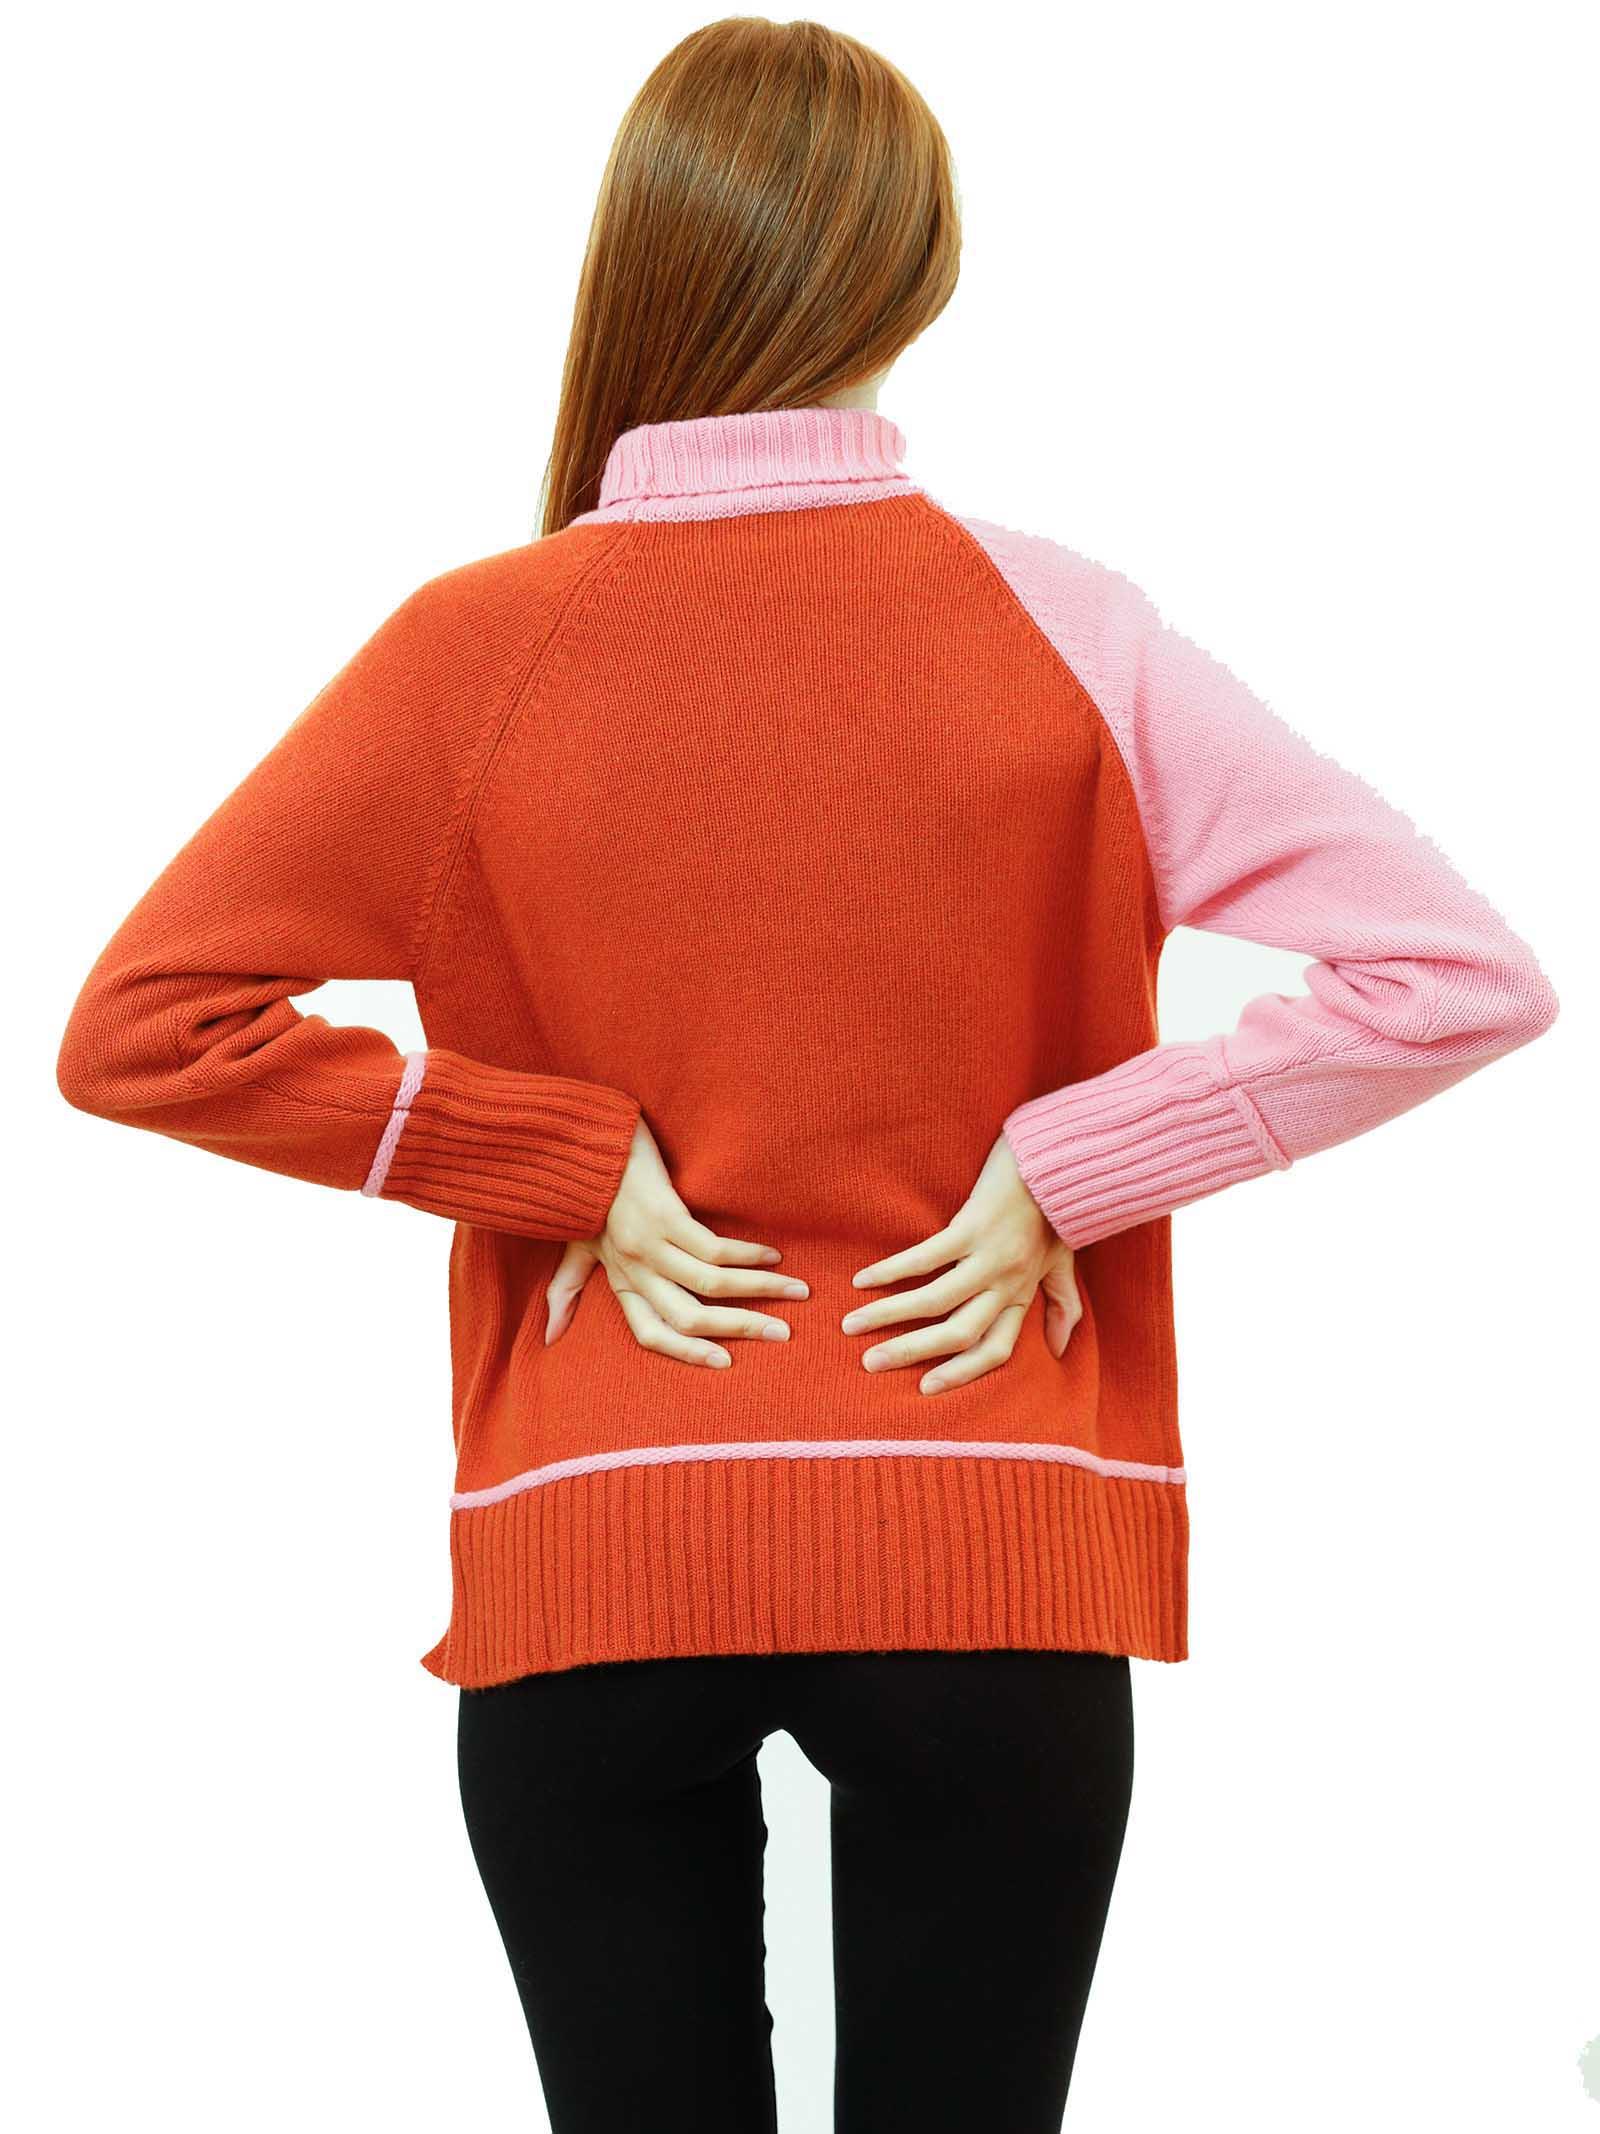 Women's Clothing Turtleneck Sweater in Pink and Brick Merino Cashmere Maliparmi | Knitwear | JQ48877431541C32